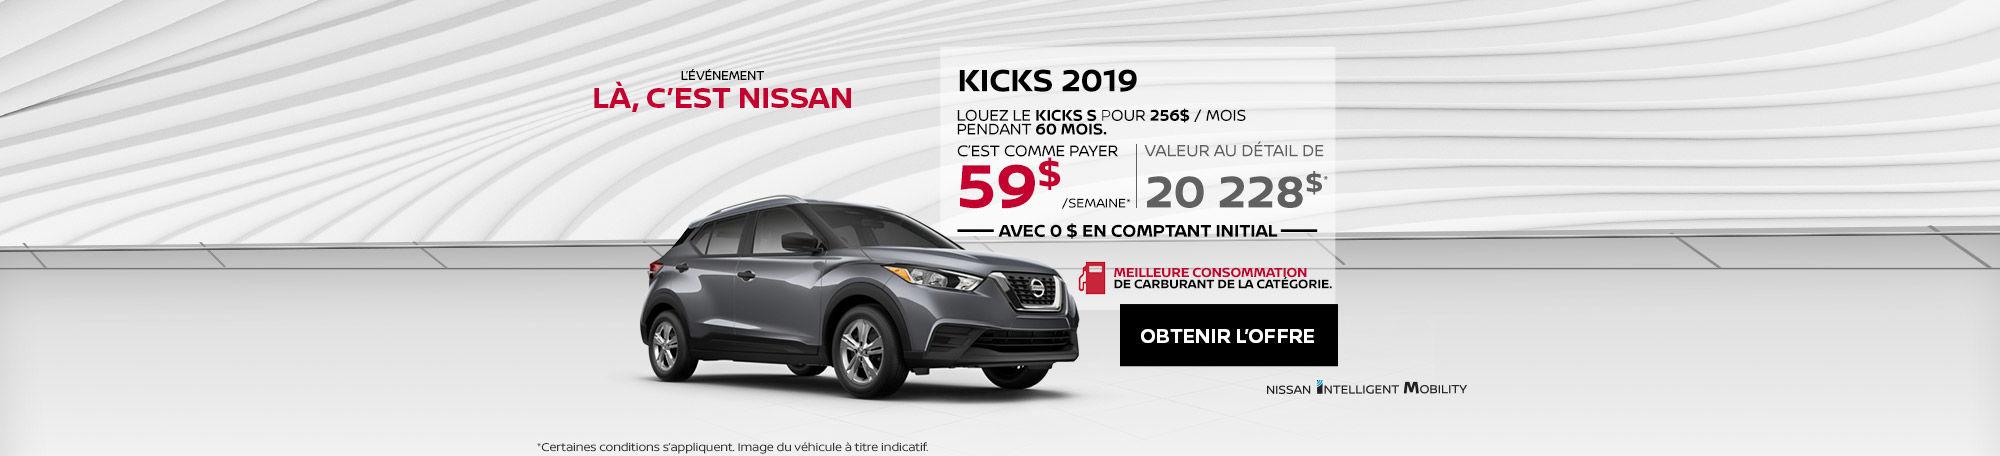 Kicks 2019